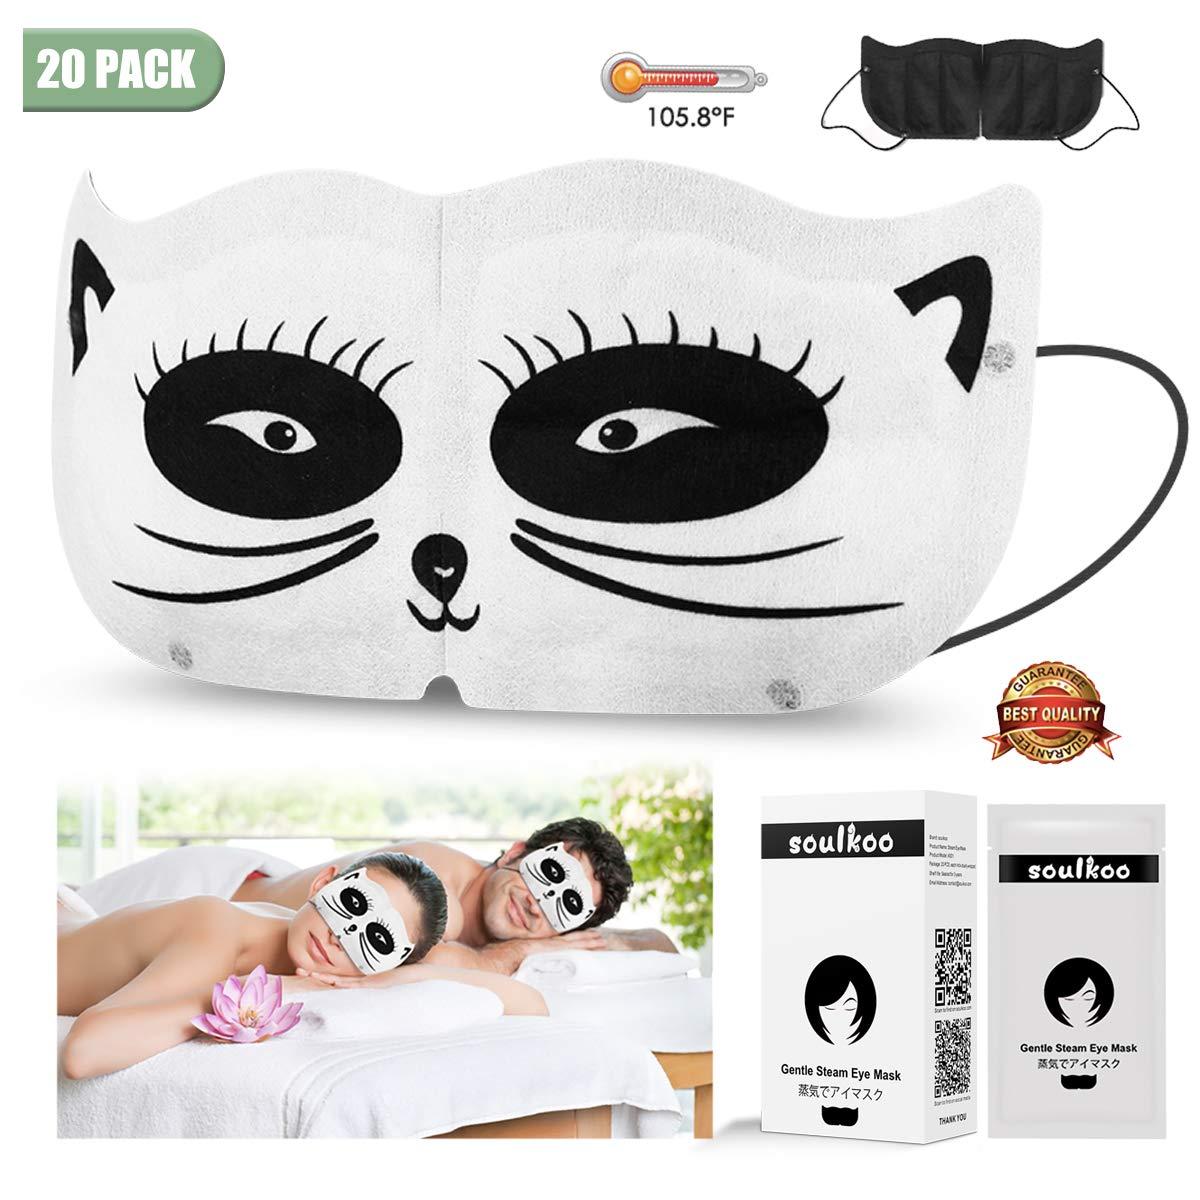 Moist Heat Eye Compress   Steam Eye Mask for Dry Eyes, Help Sleep, Blackout, Breathable, Relieves Eyestrain Fatigue Dryness Soreness, Men Women, 20 Sheets by soulkoo